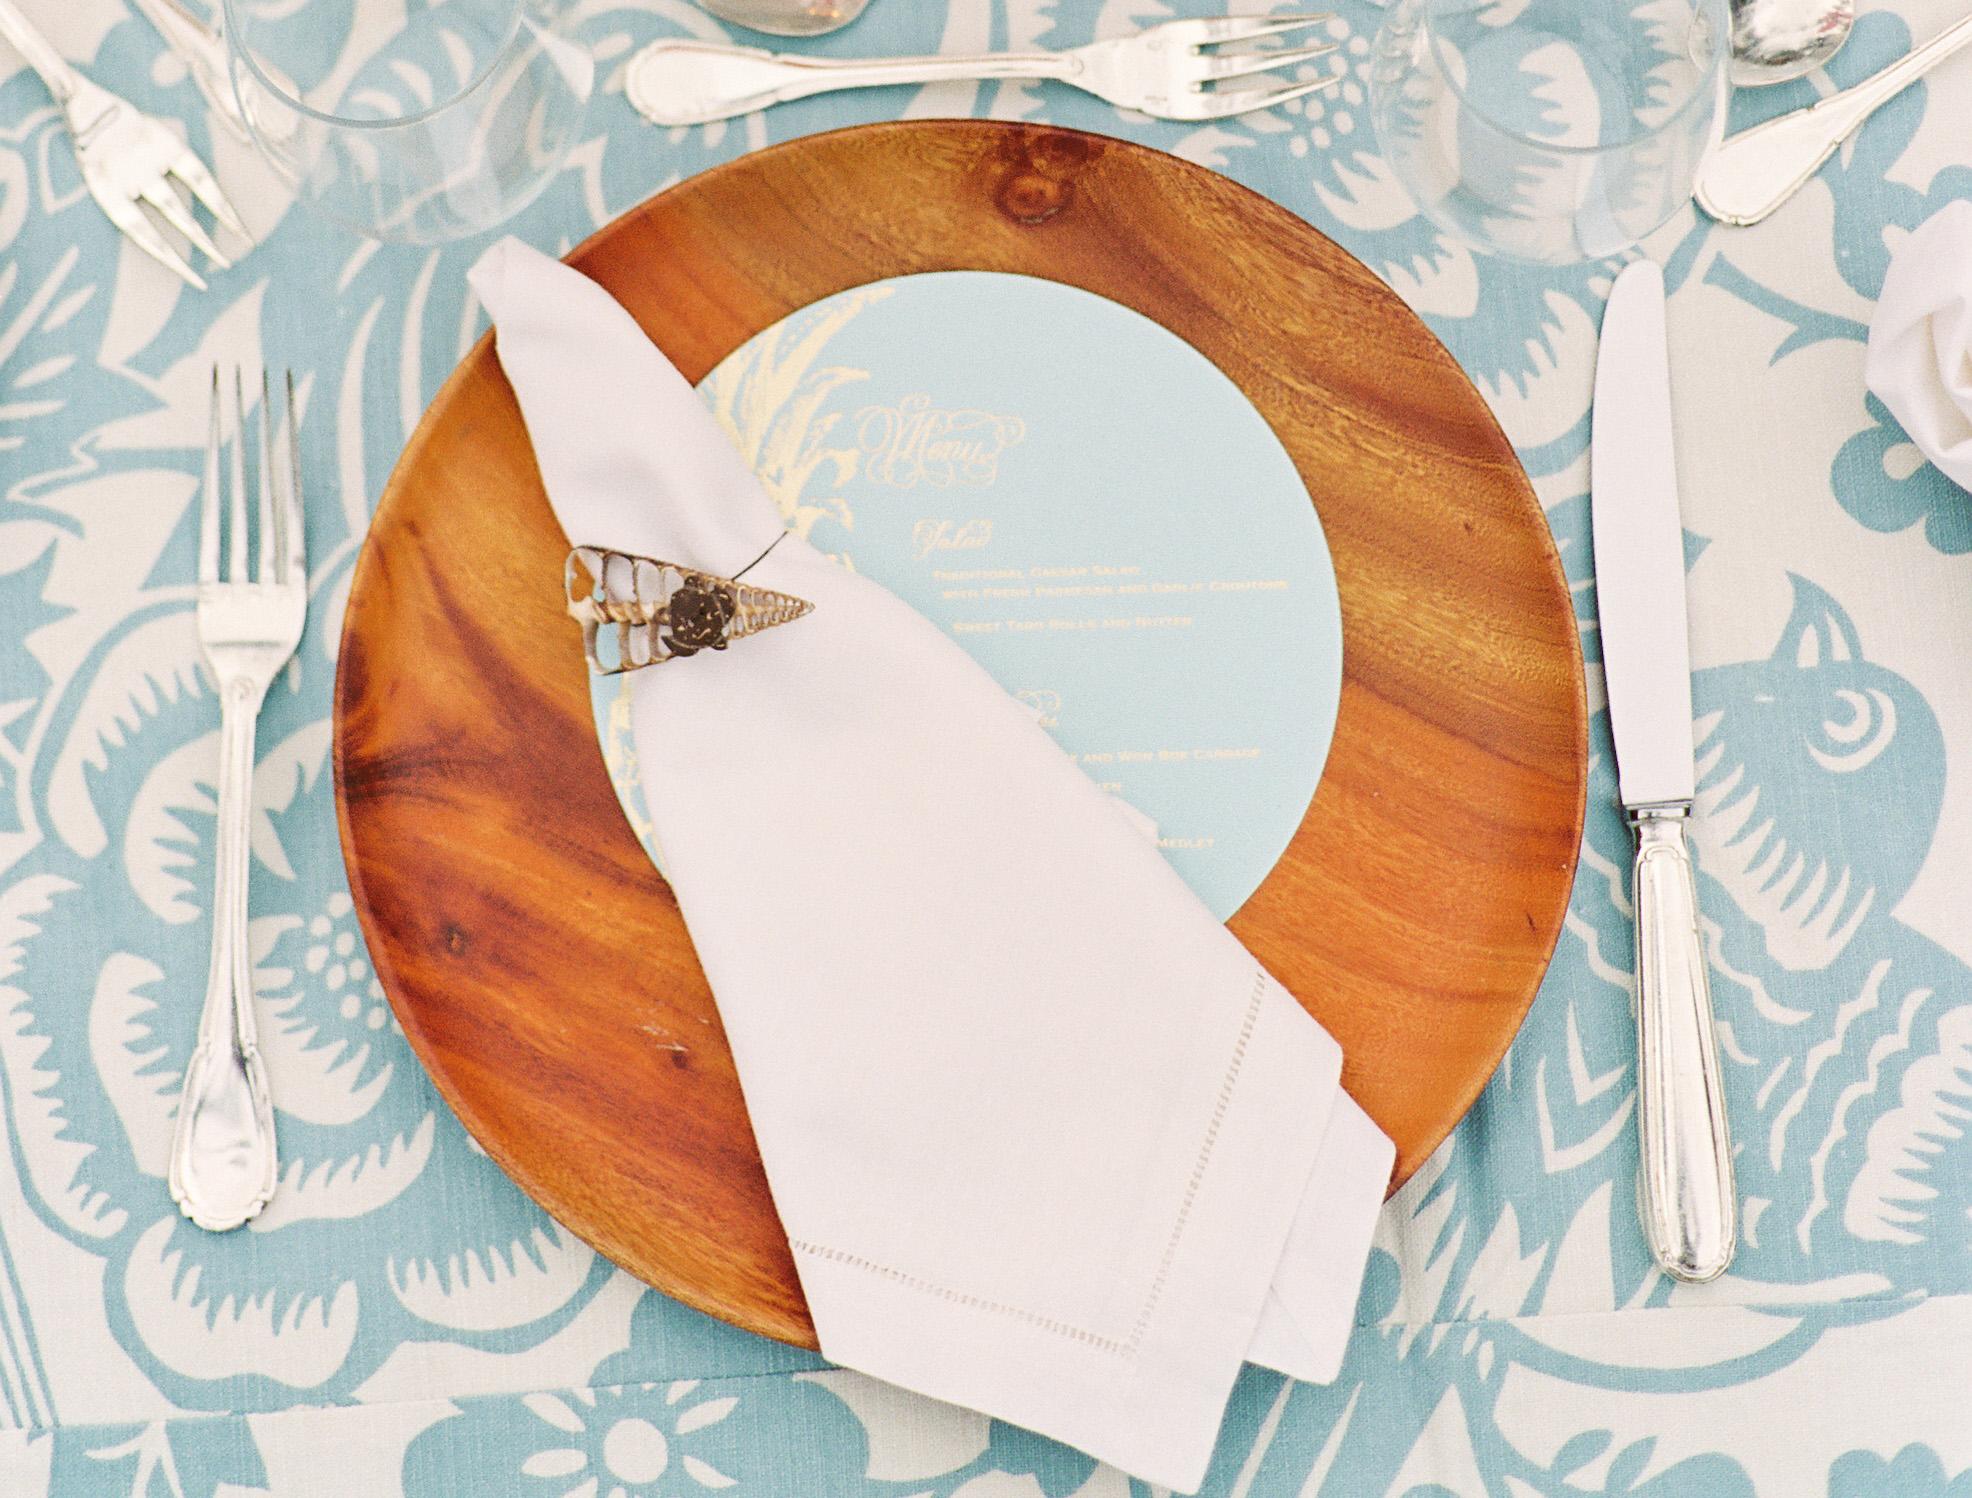 hawaiian wedding decor, wooden charger, sky blue patterned linens